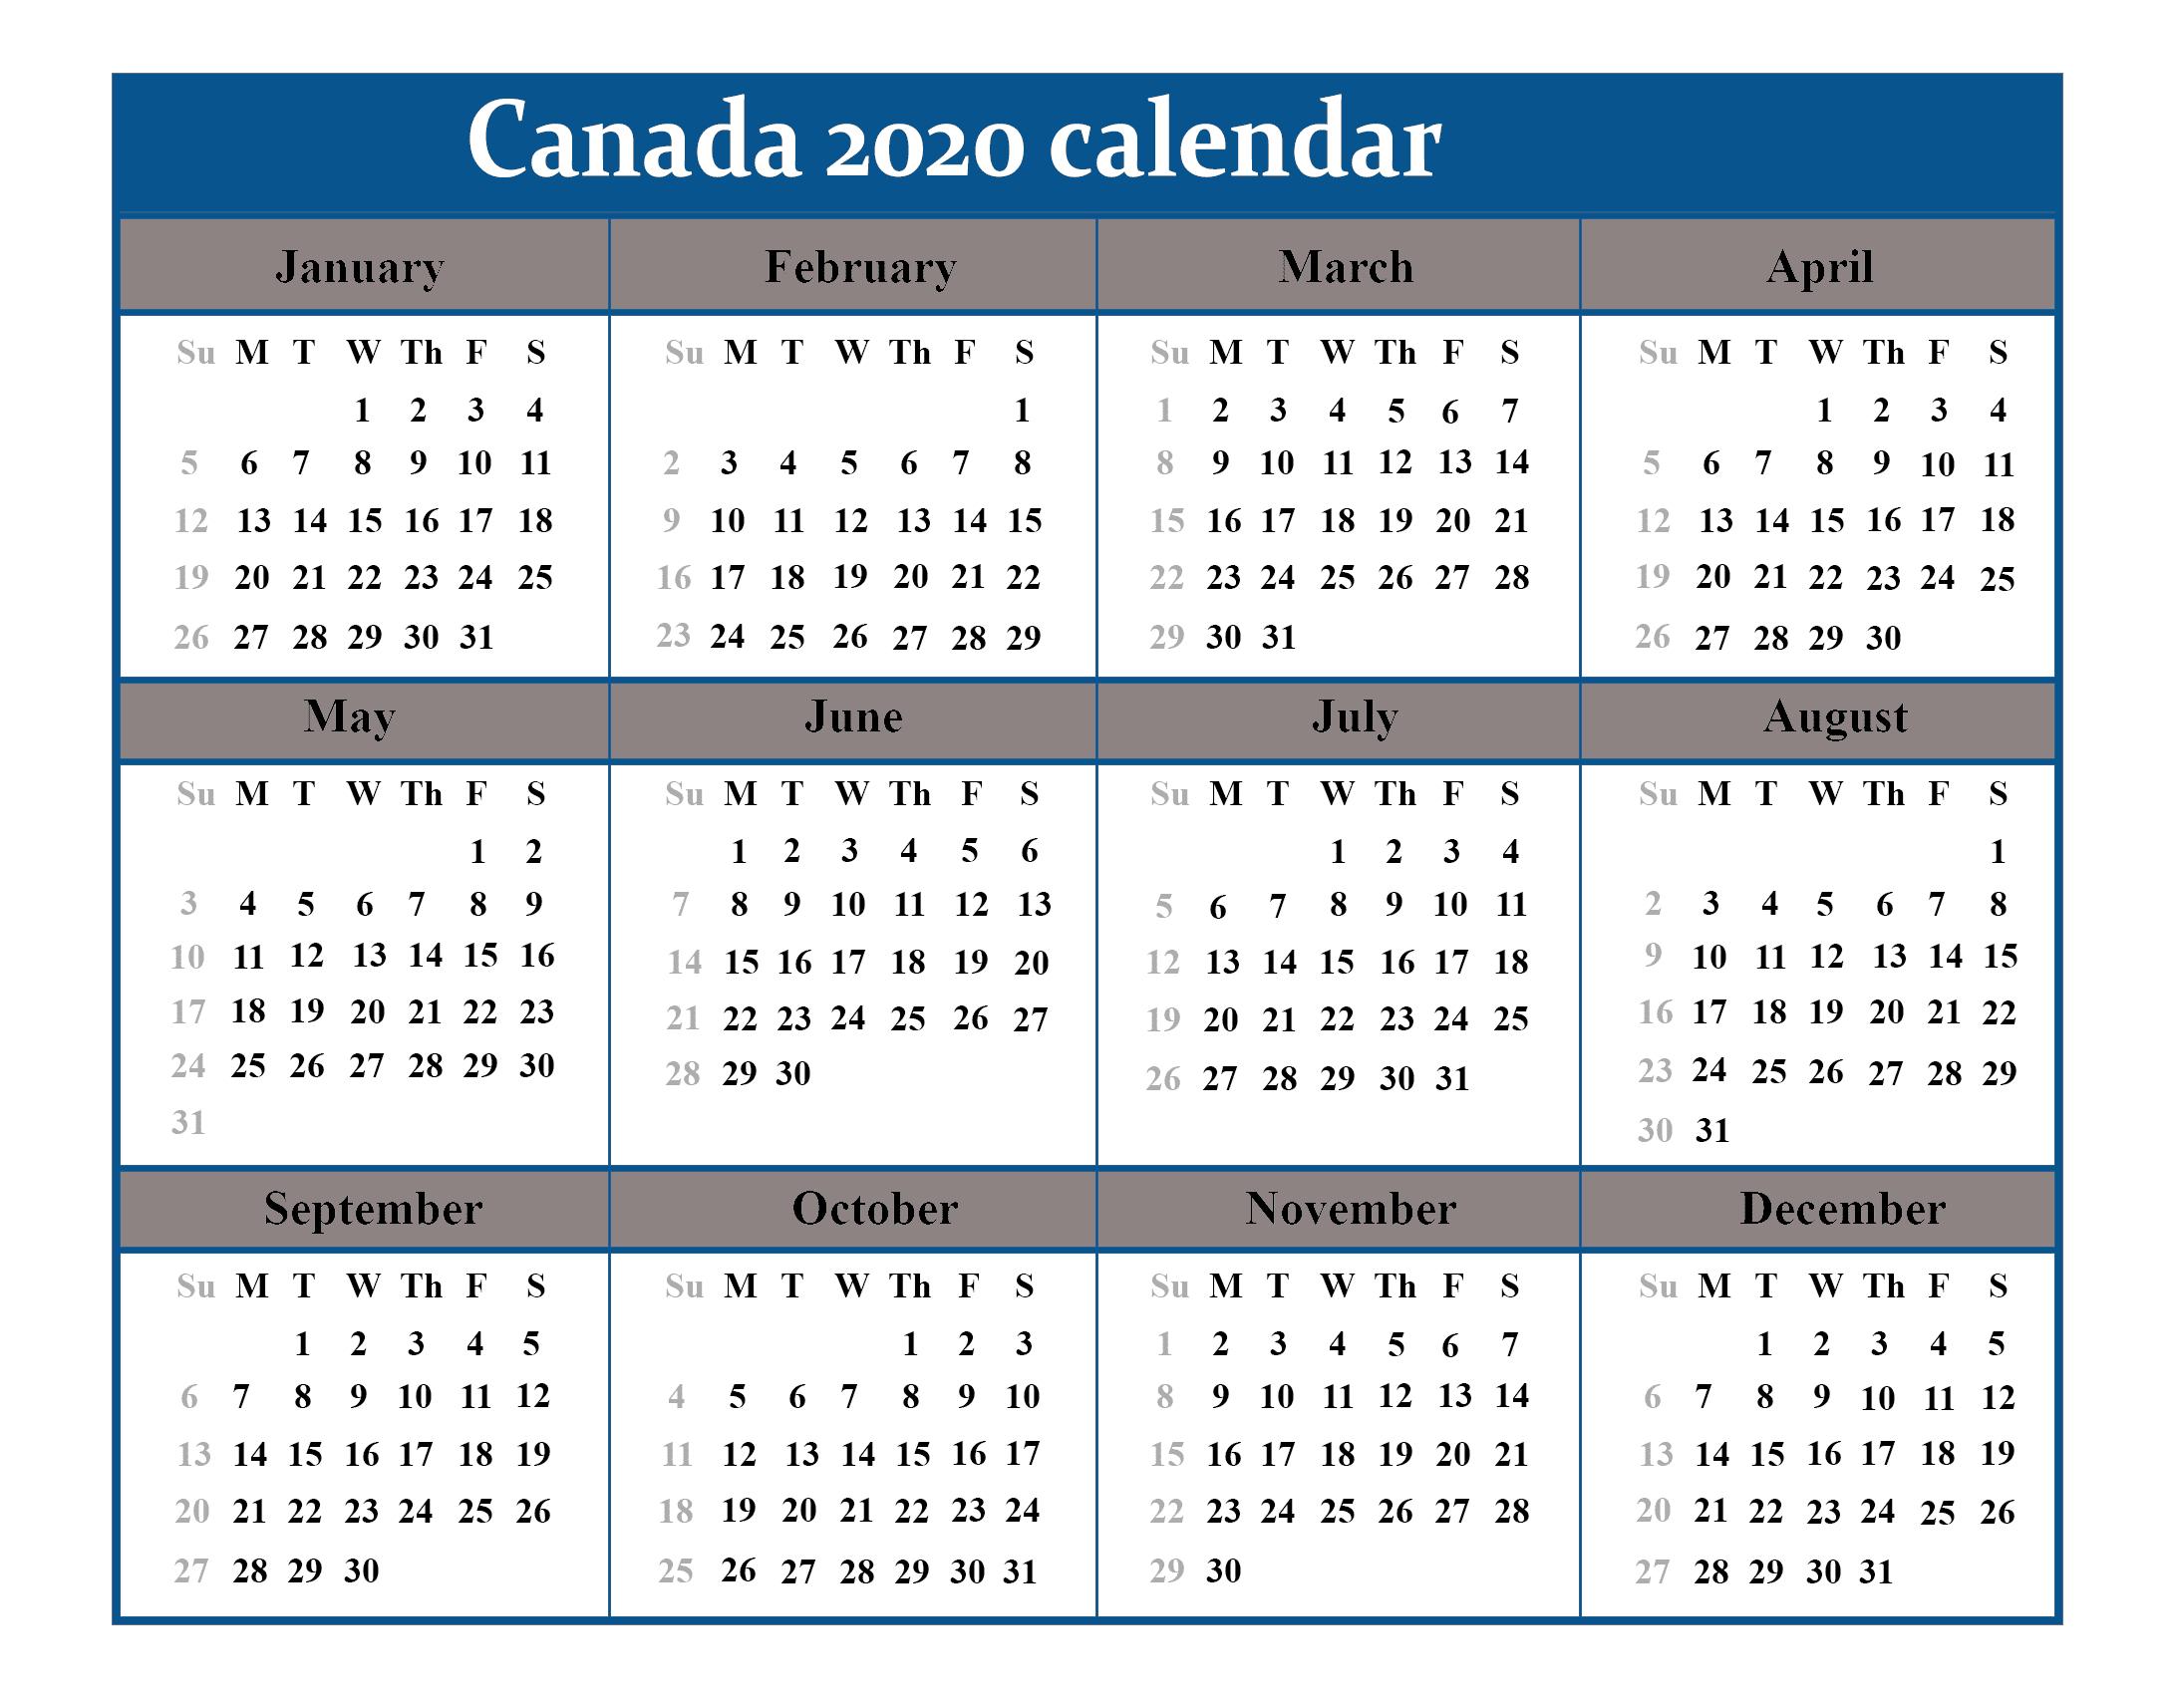 Canada 2020 Calendar | Best Printable Calendar